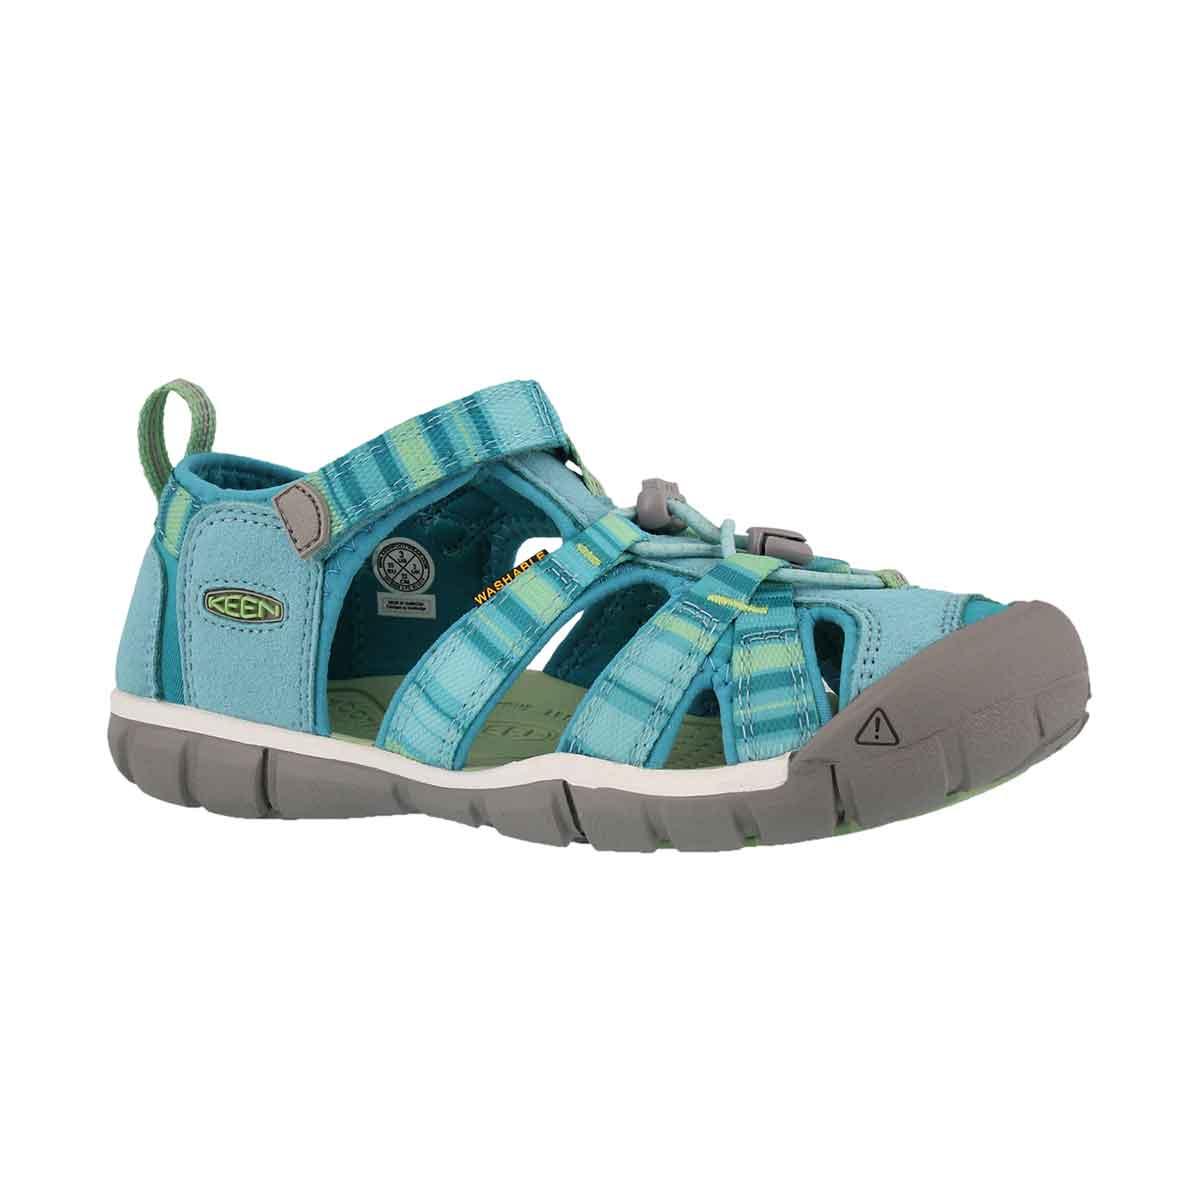 Girls' SEACAMP II pastel turquoise raya sandals